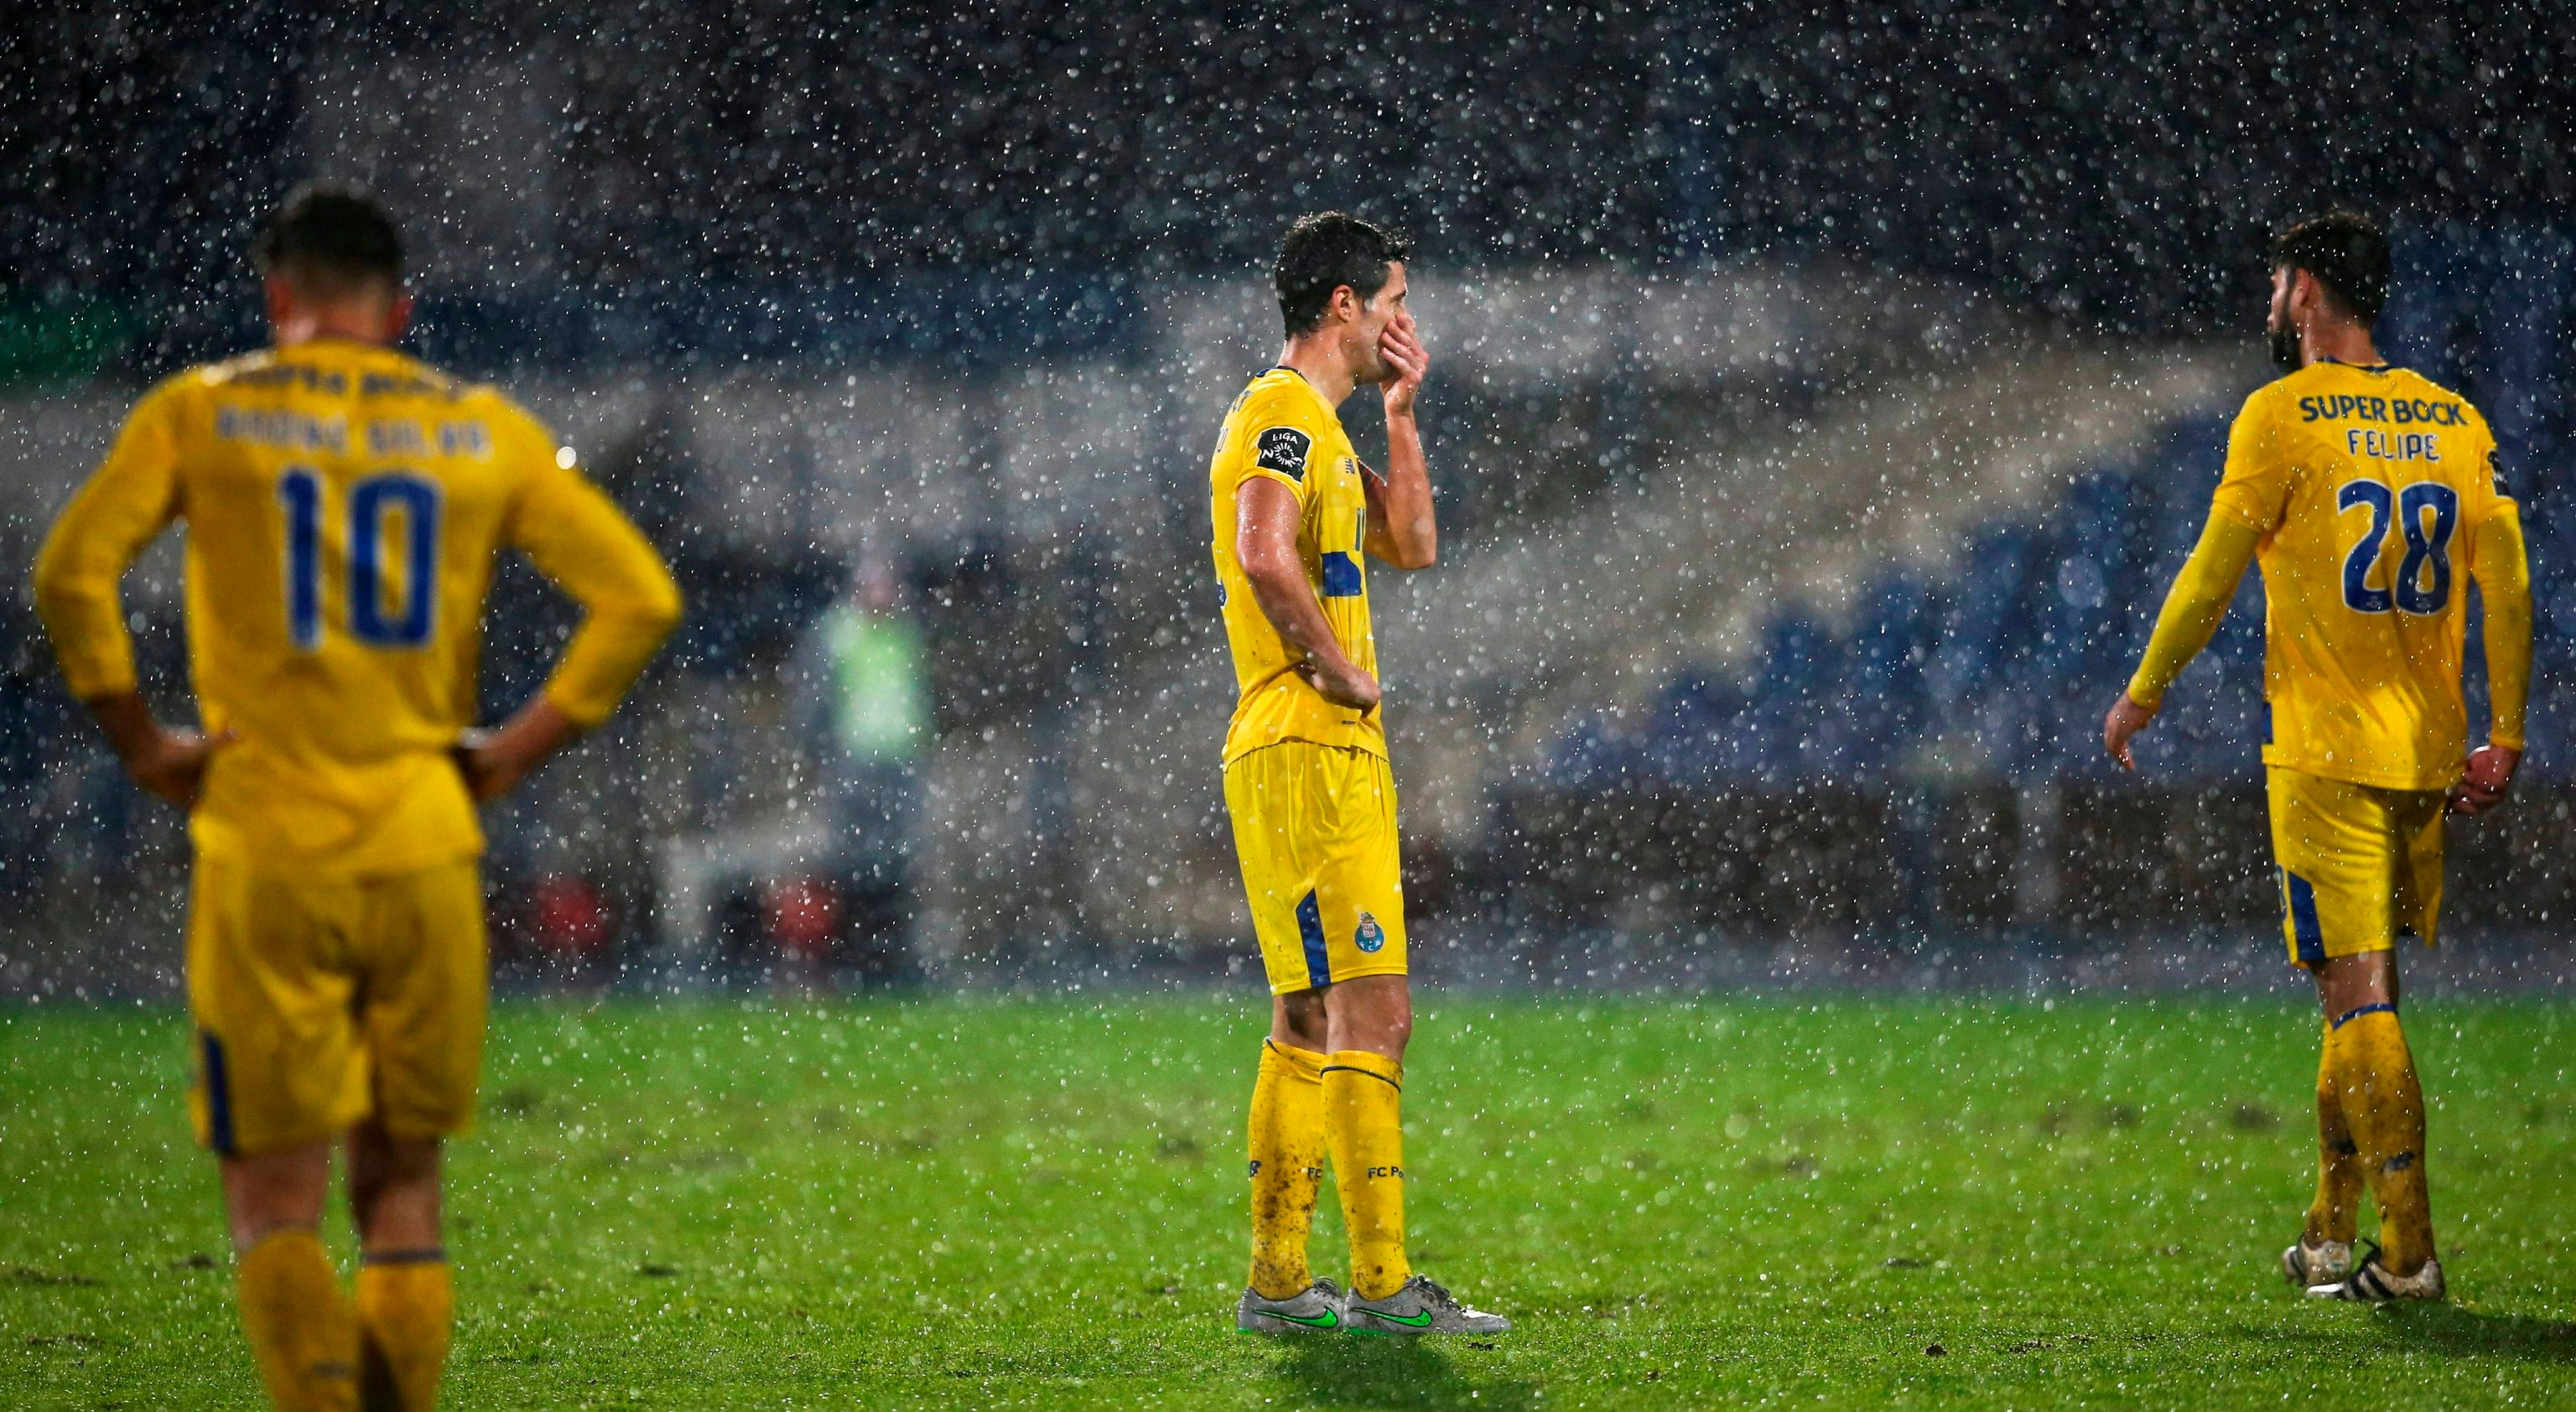 Crise no FC Porto preocupa Guilherme Aguiar